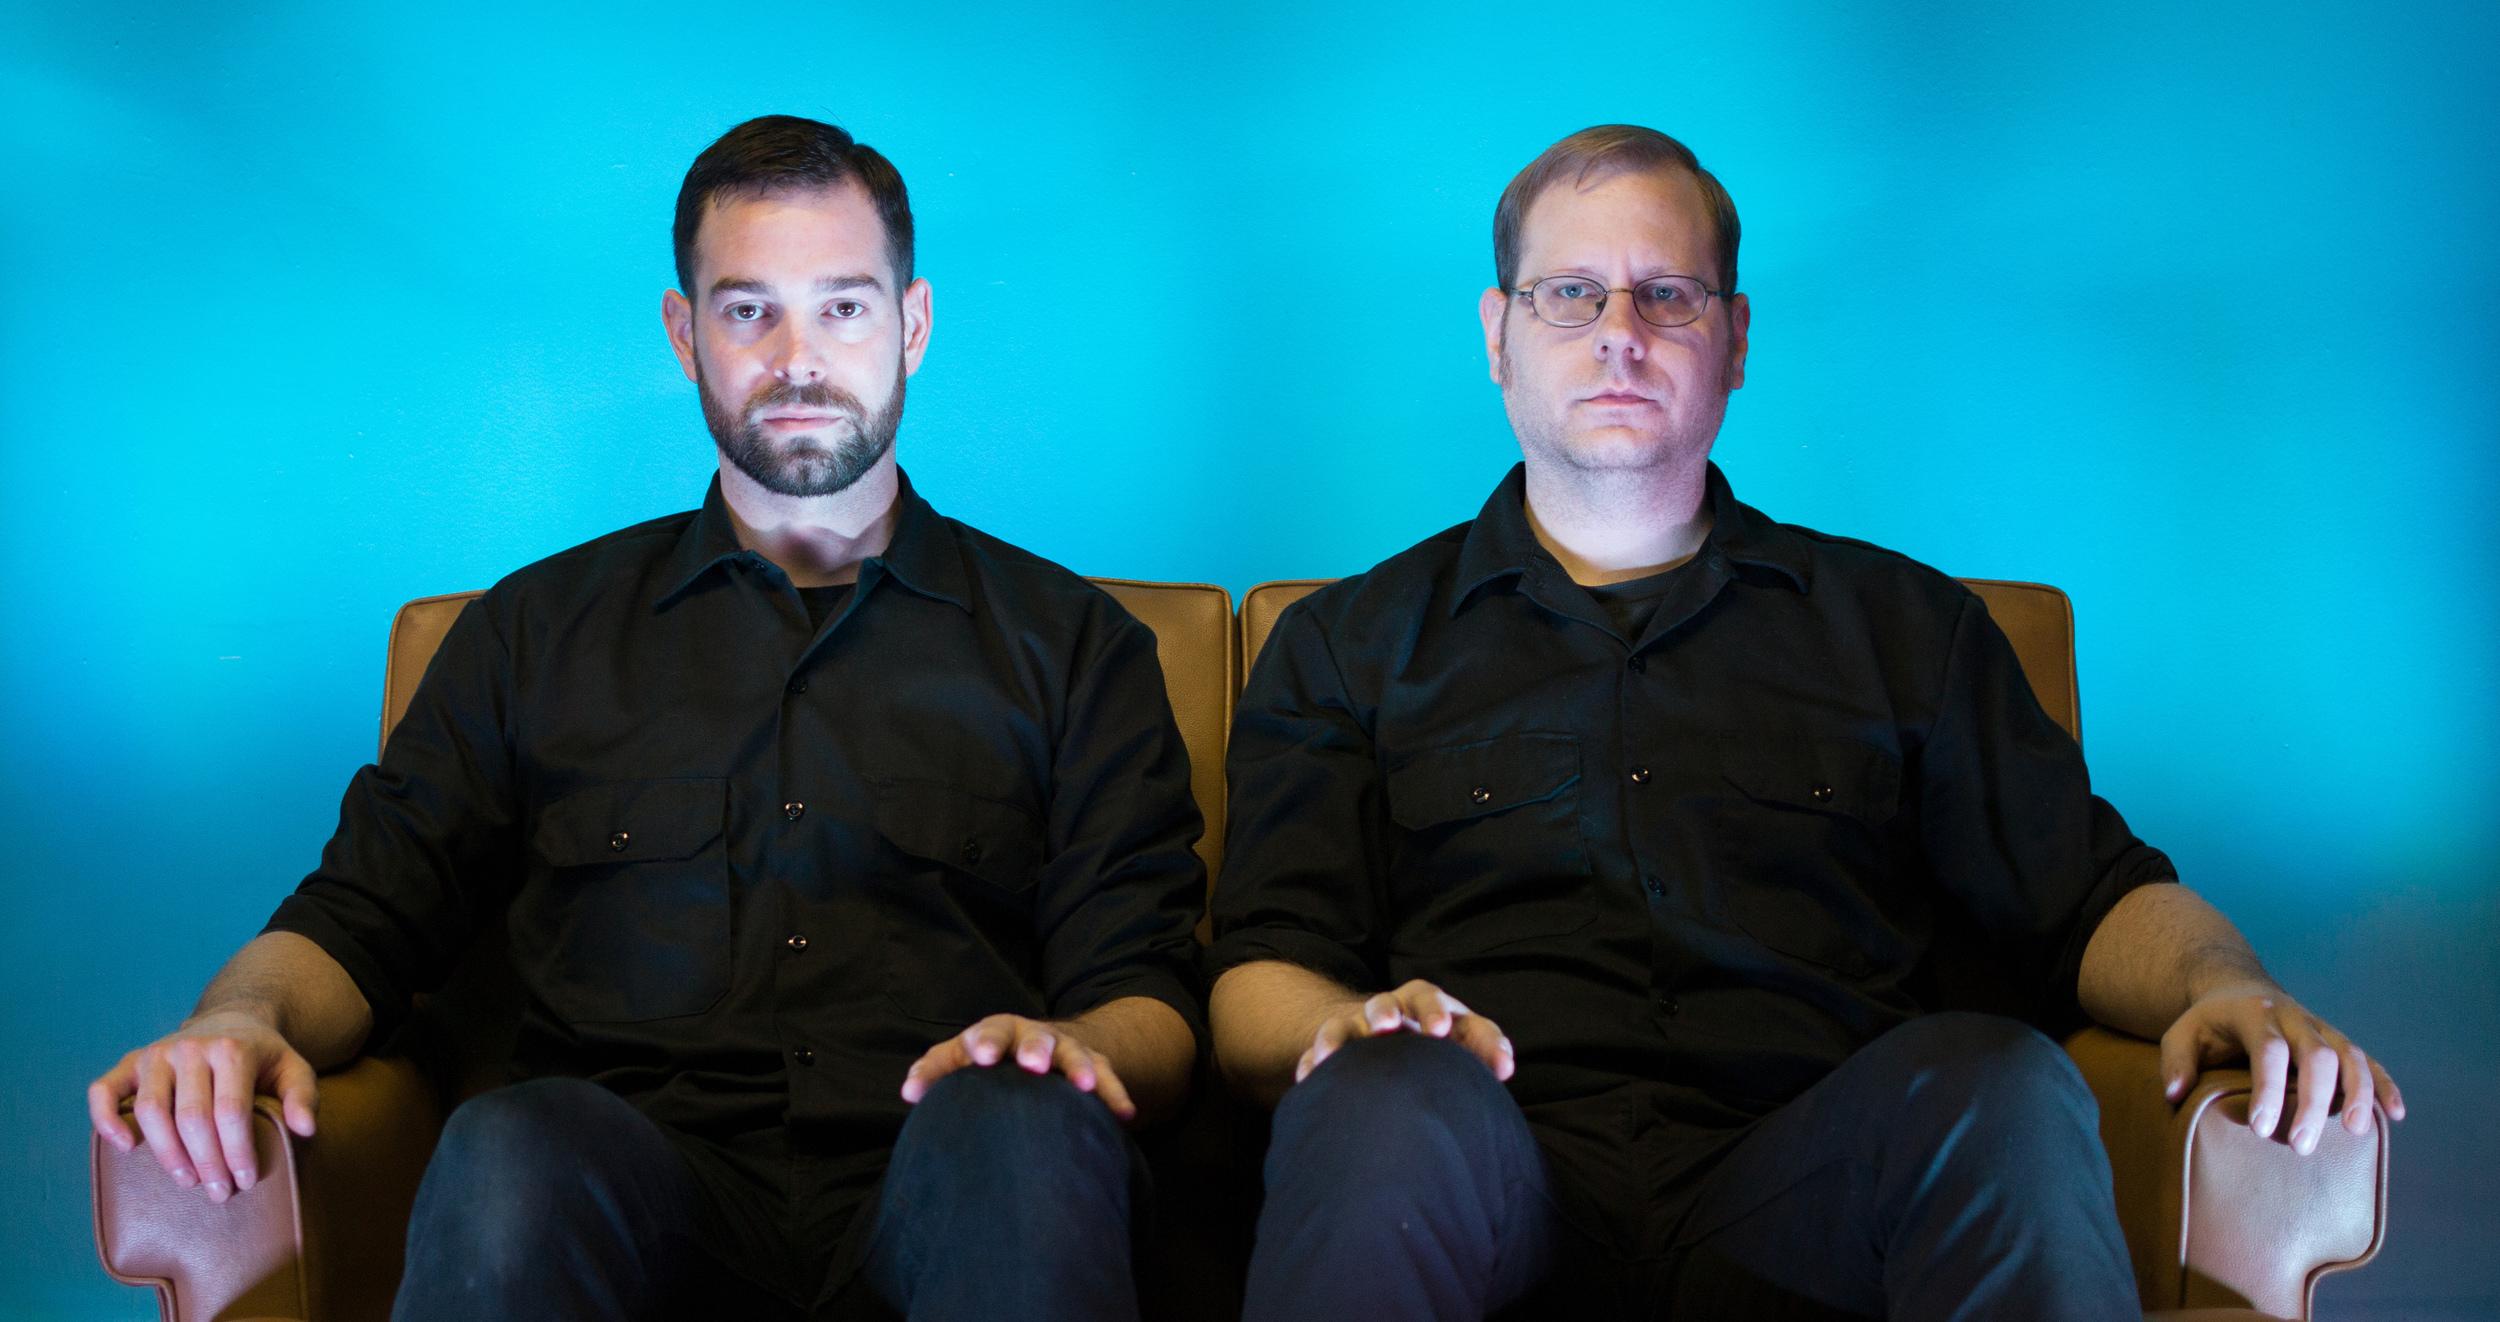 Matt&JoeCouchBlue001Corrected.jpg